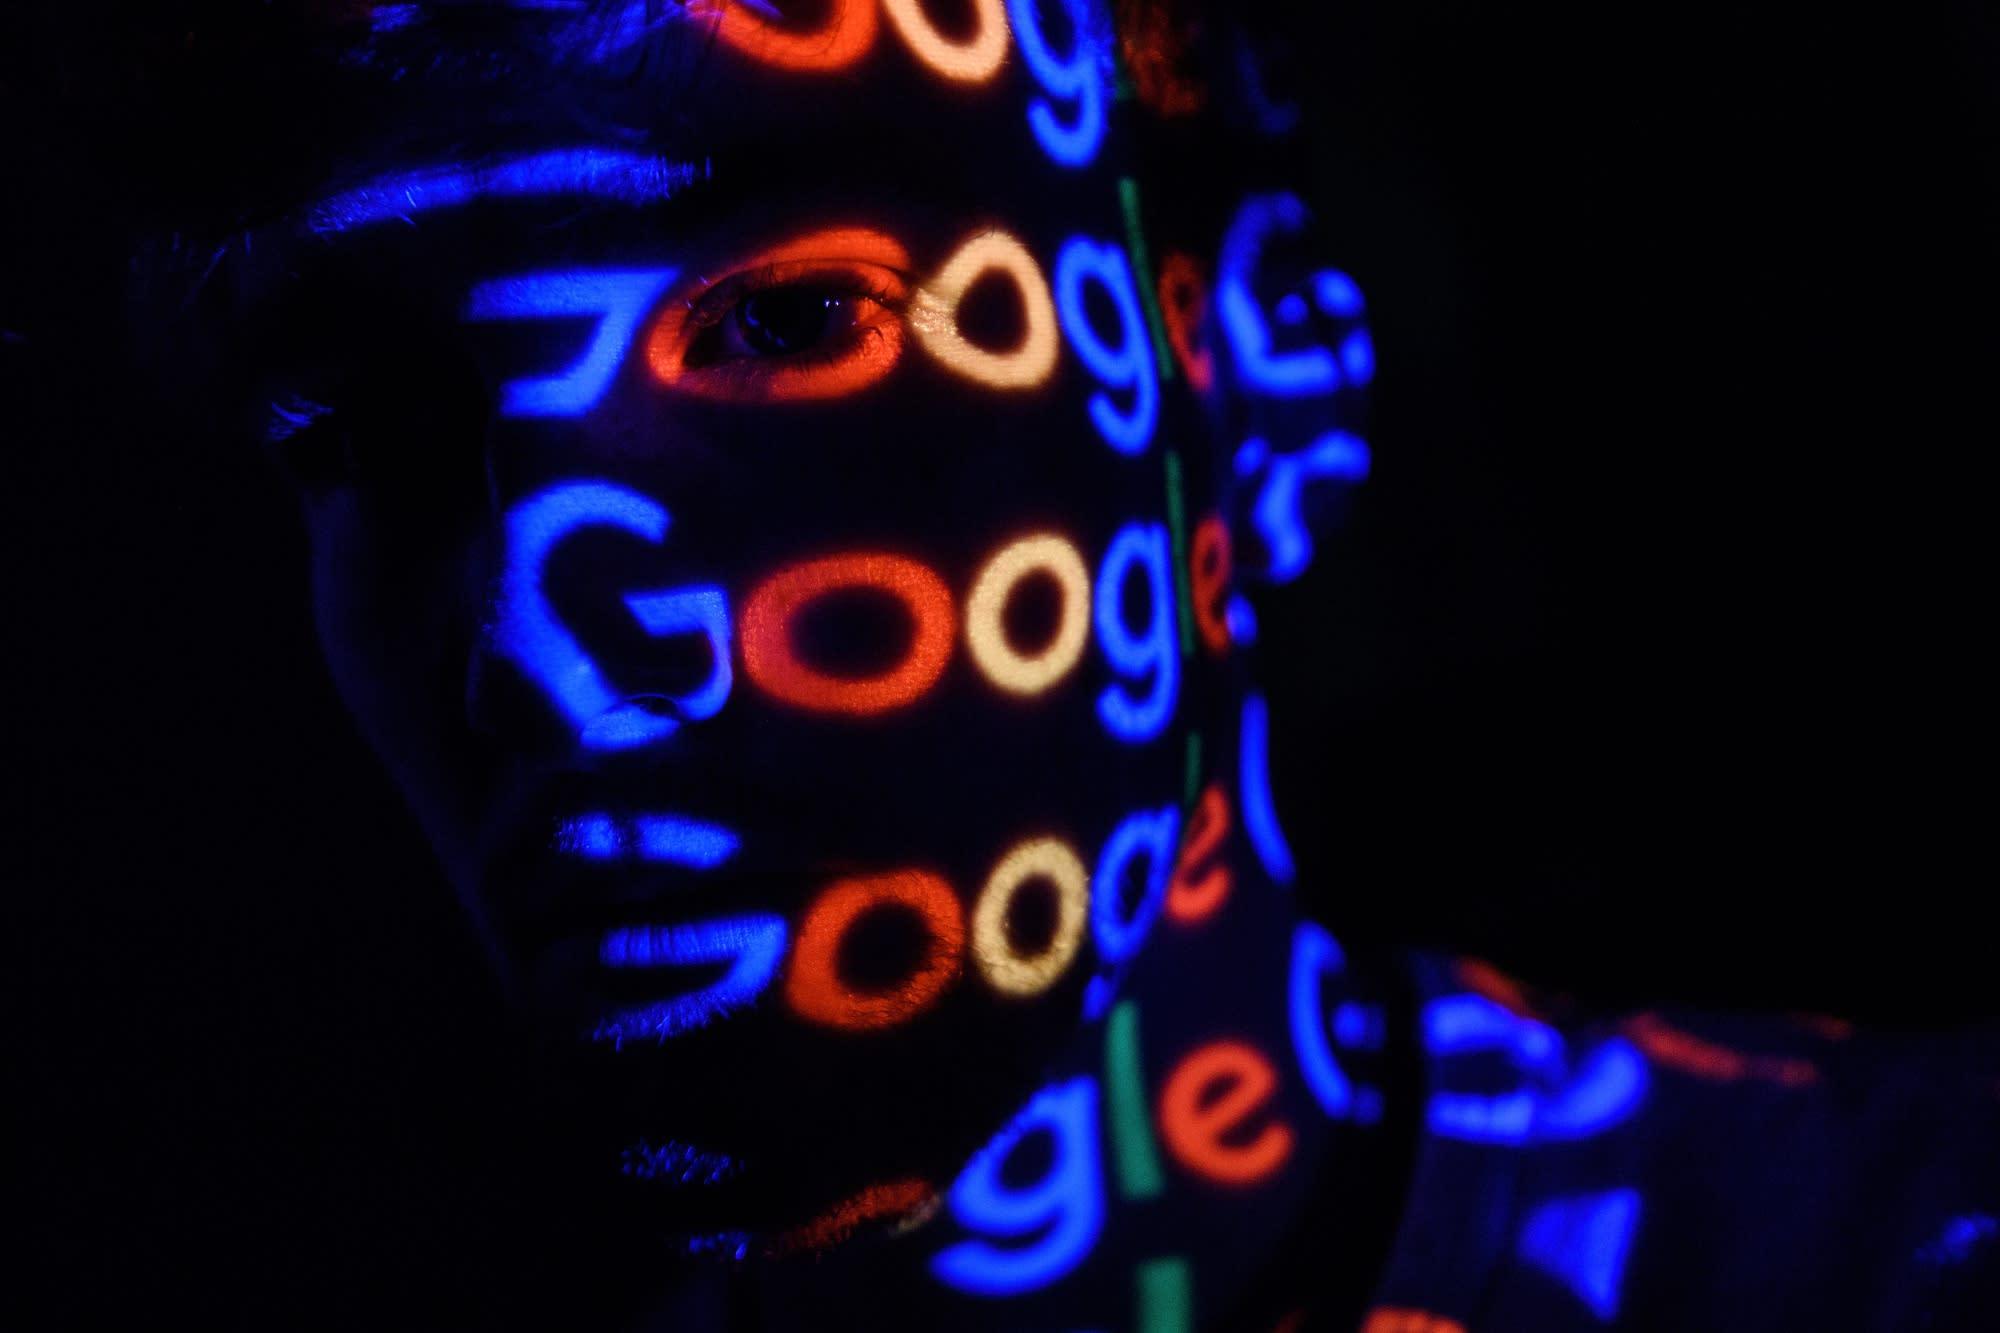 USA  states launch anti-trust investigation into Google